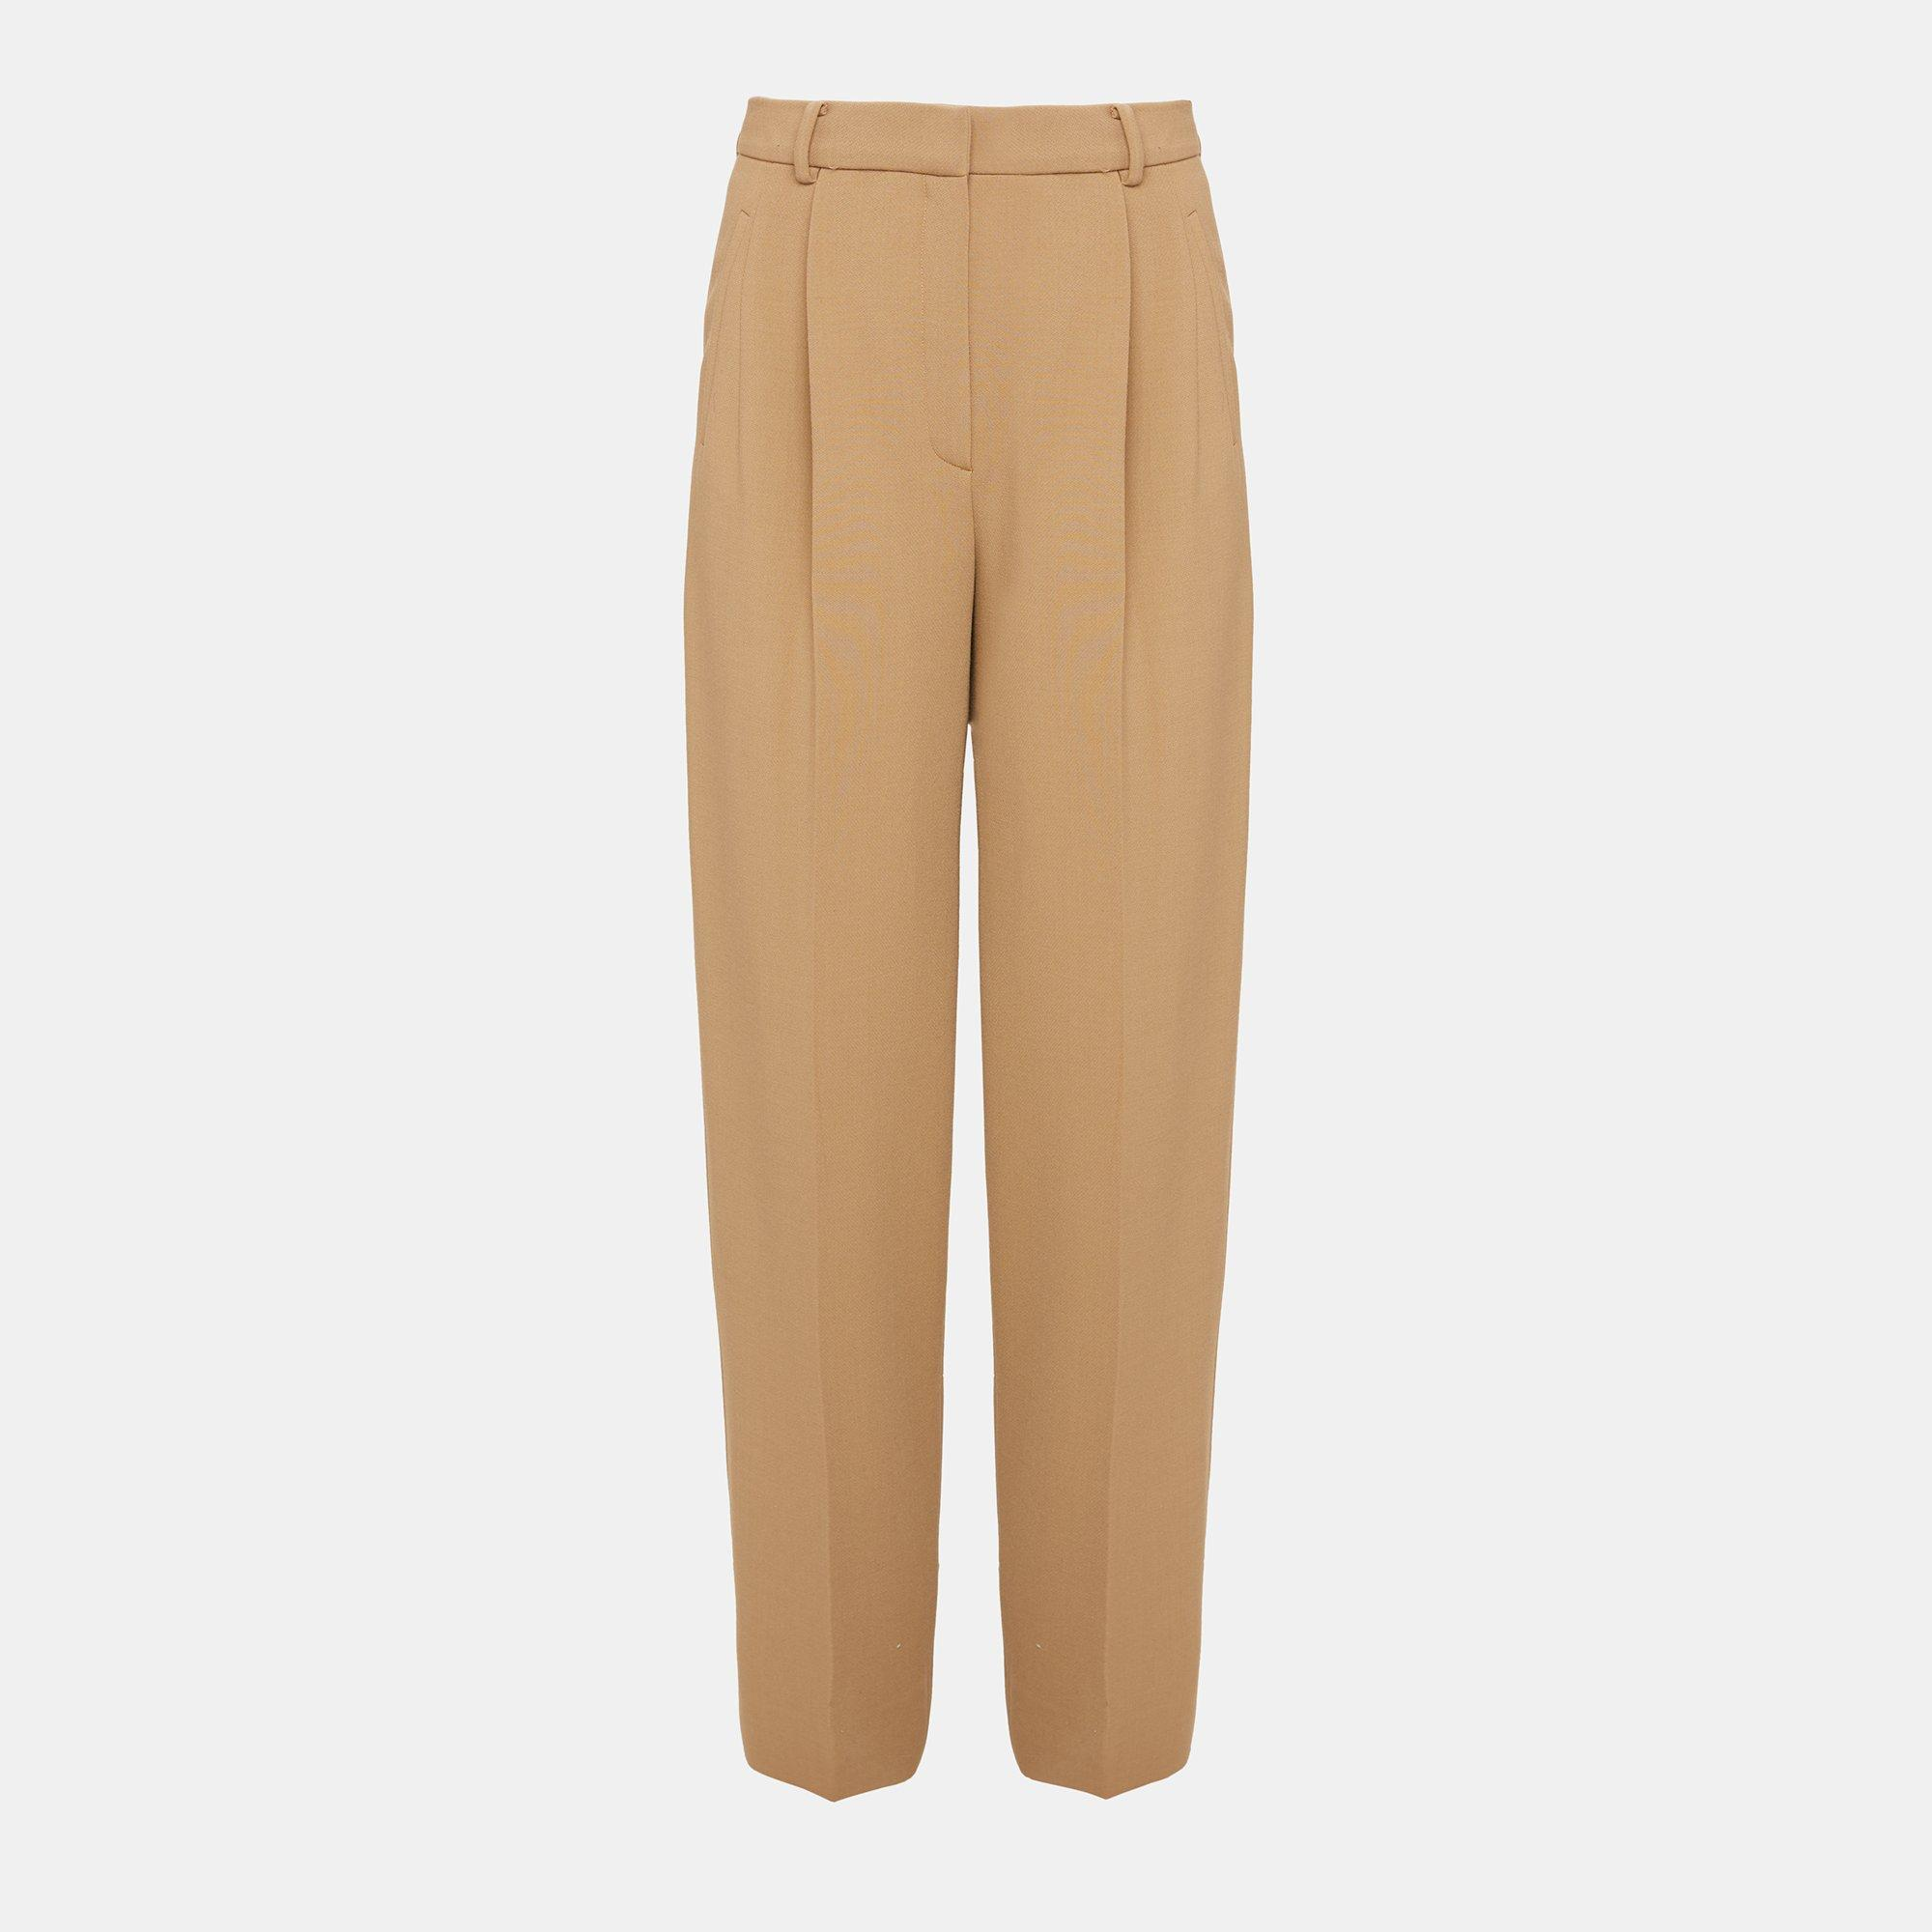 Stretch Wool Pleated High-Waist Pant